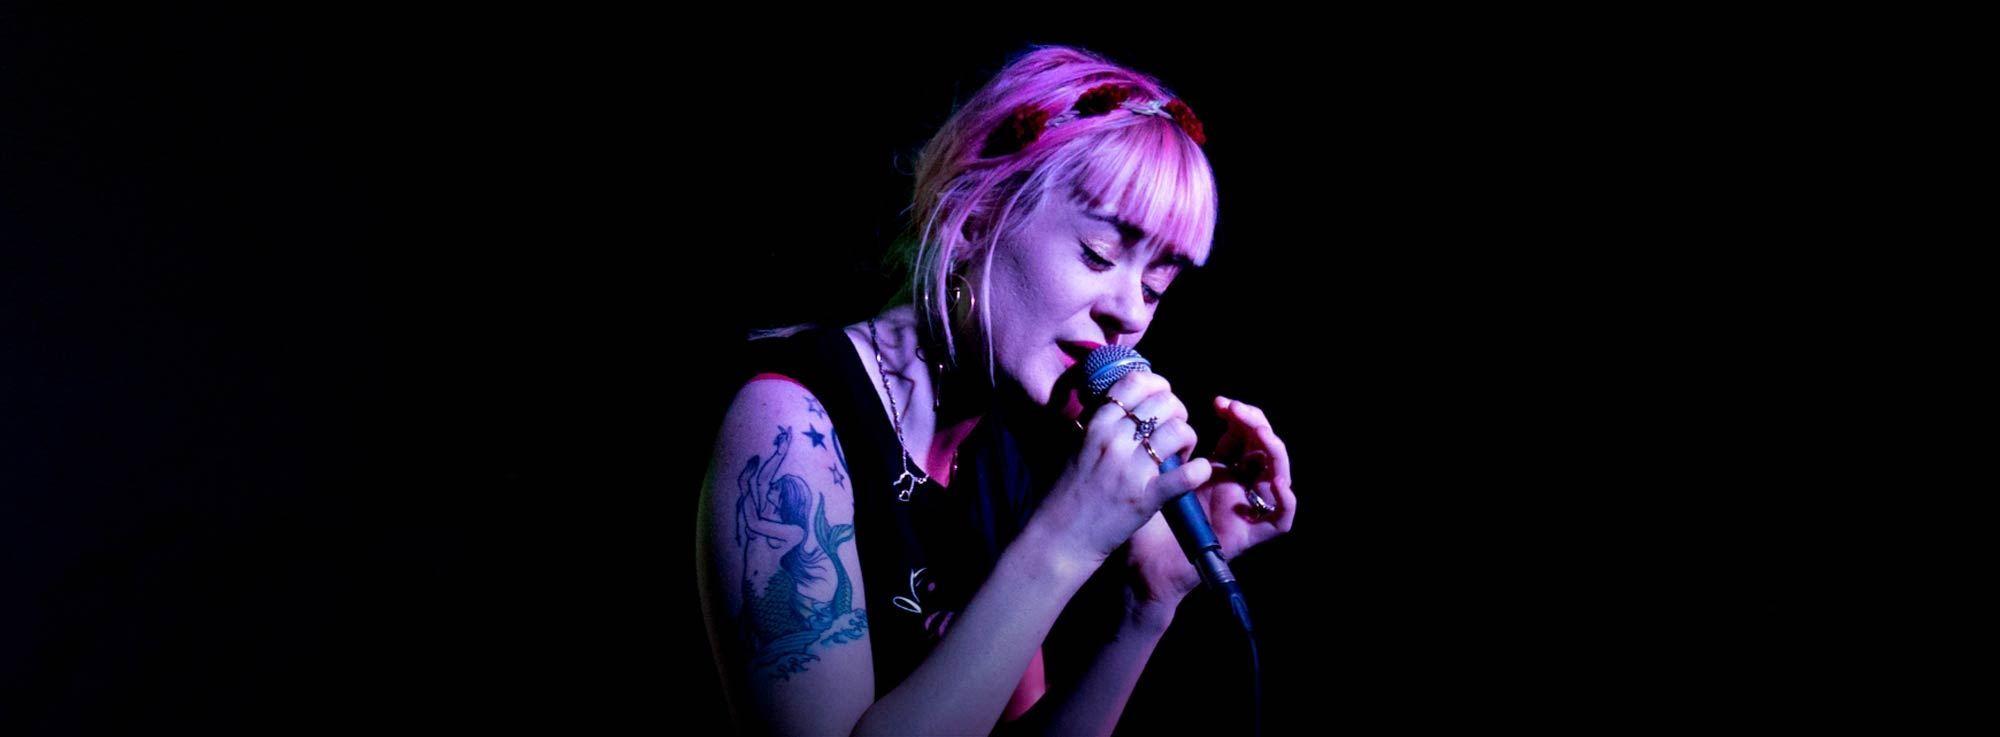 Taranto: Sarah Dietrich - live acustico